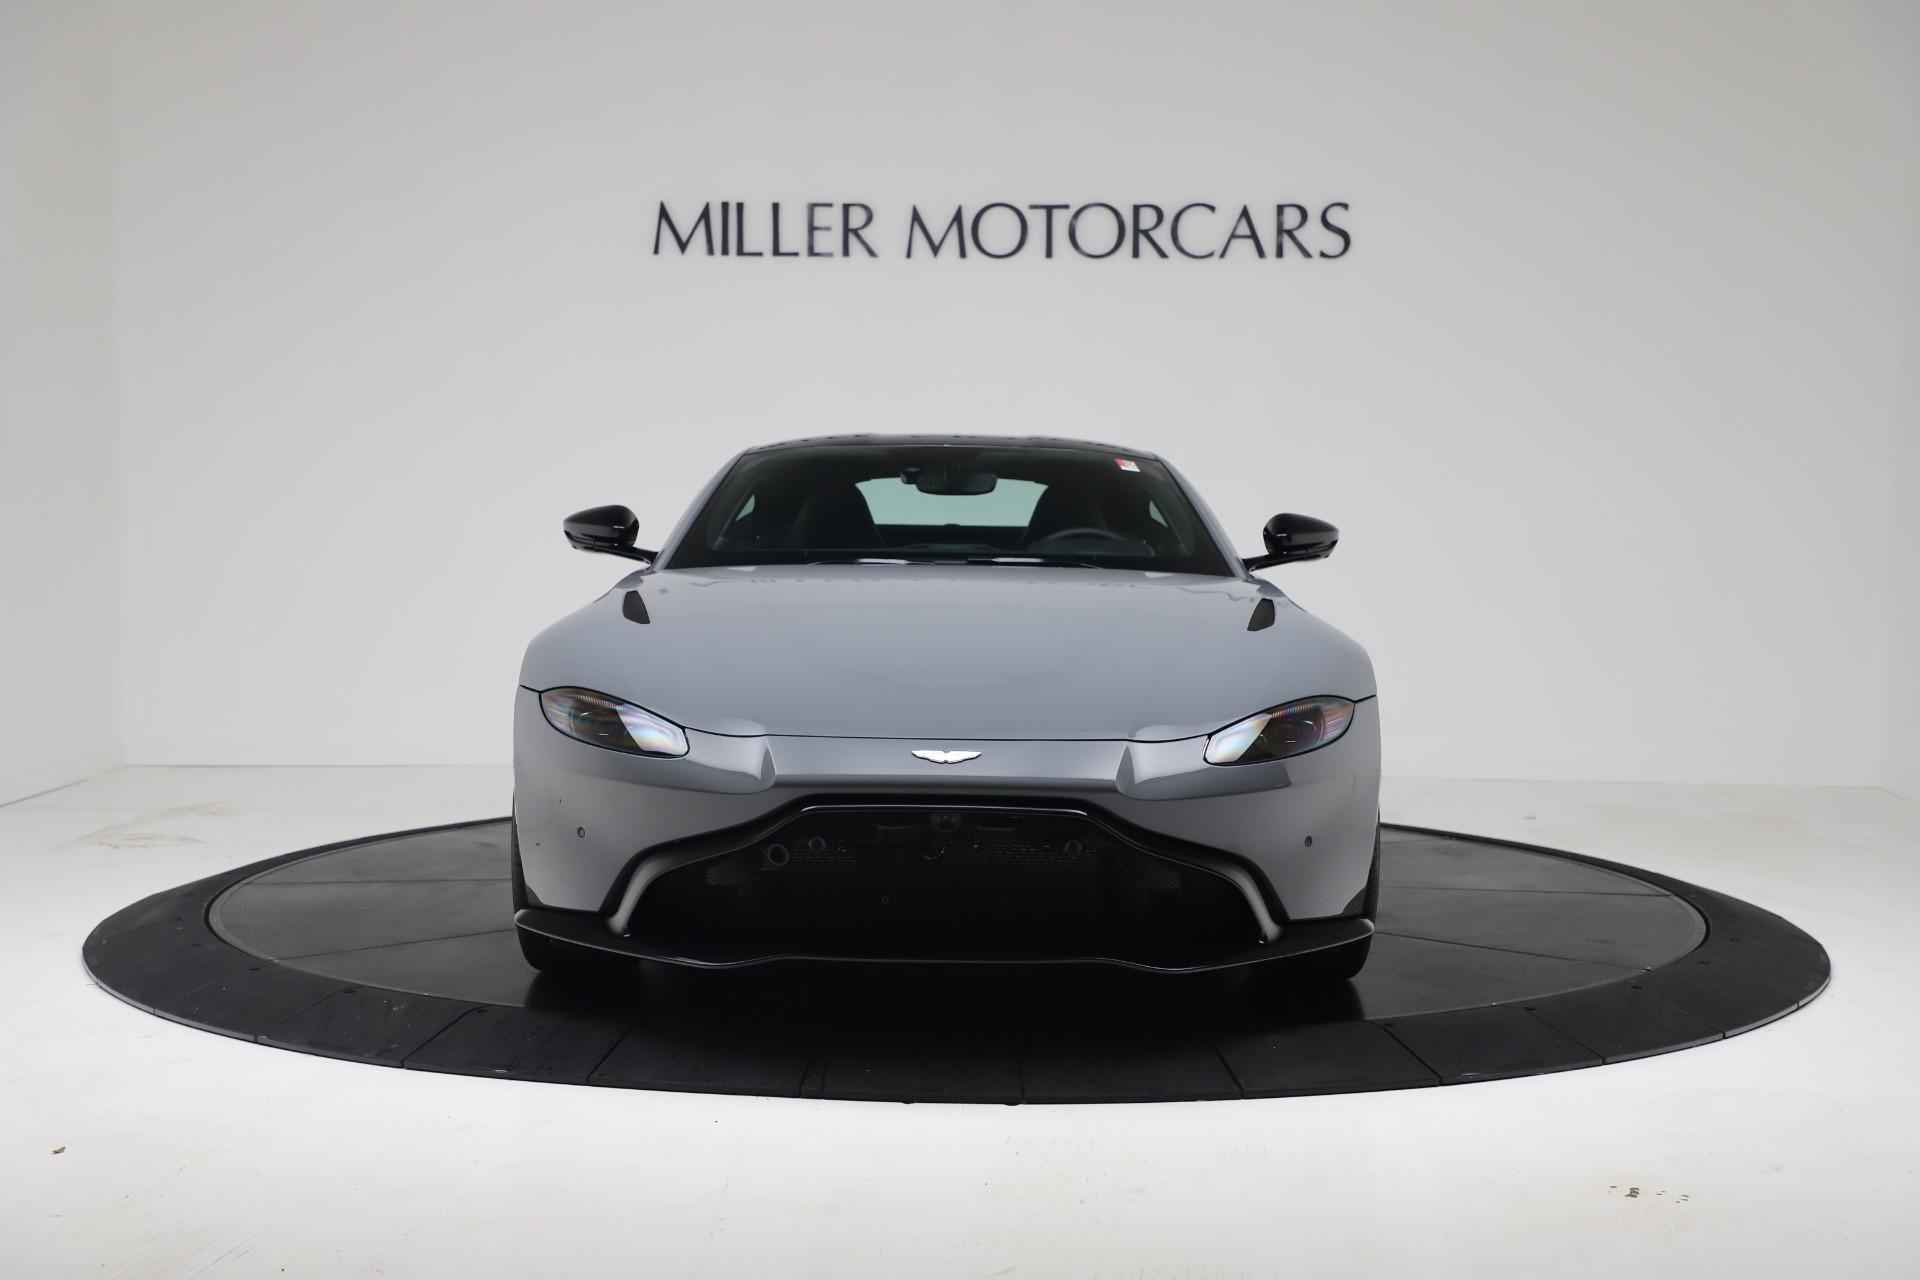 New 2020 Aston Martin Vantage V8 For Sale In Greenwich, CT 3482_p6